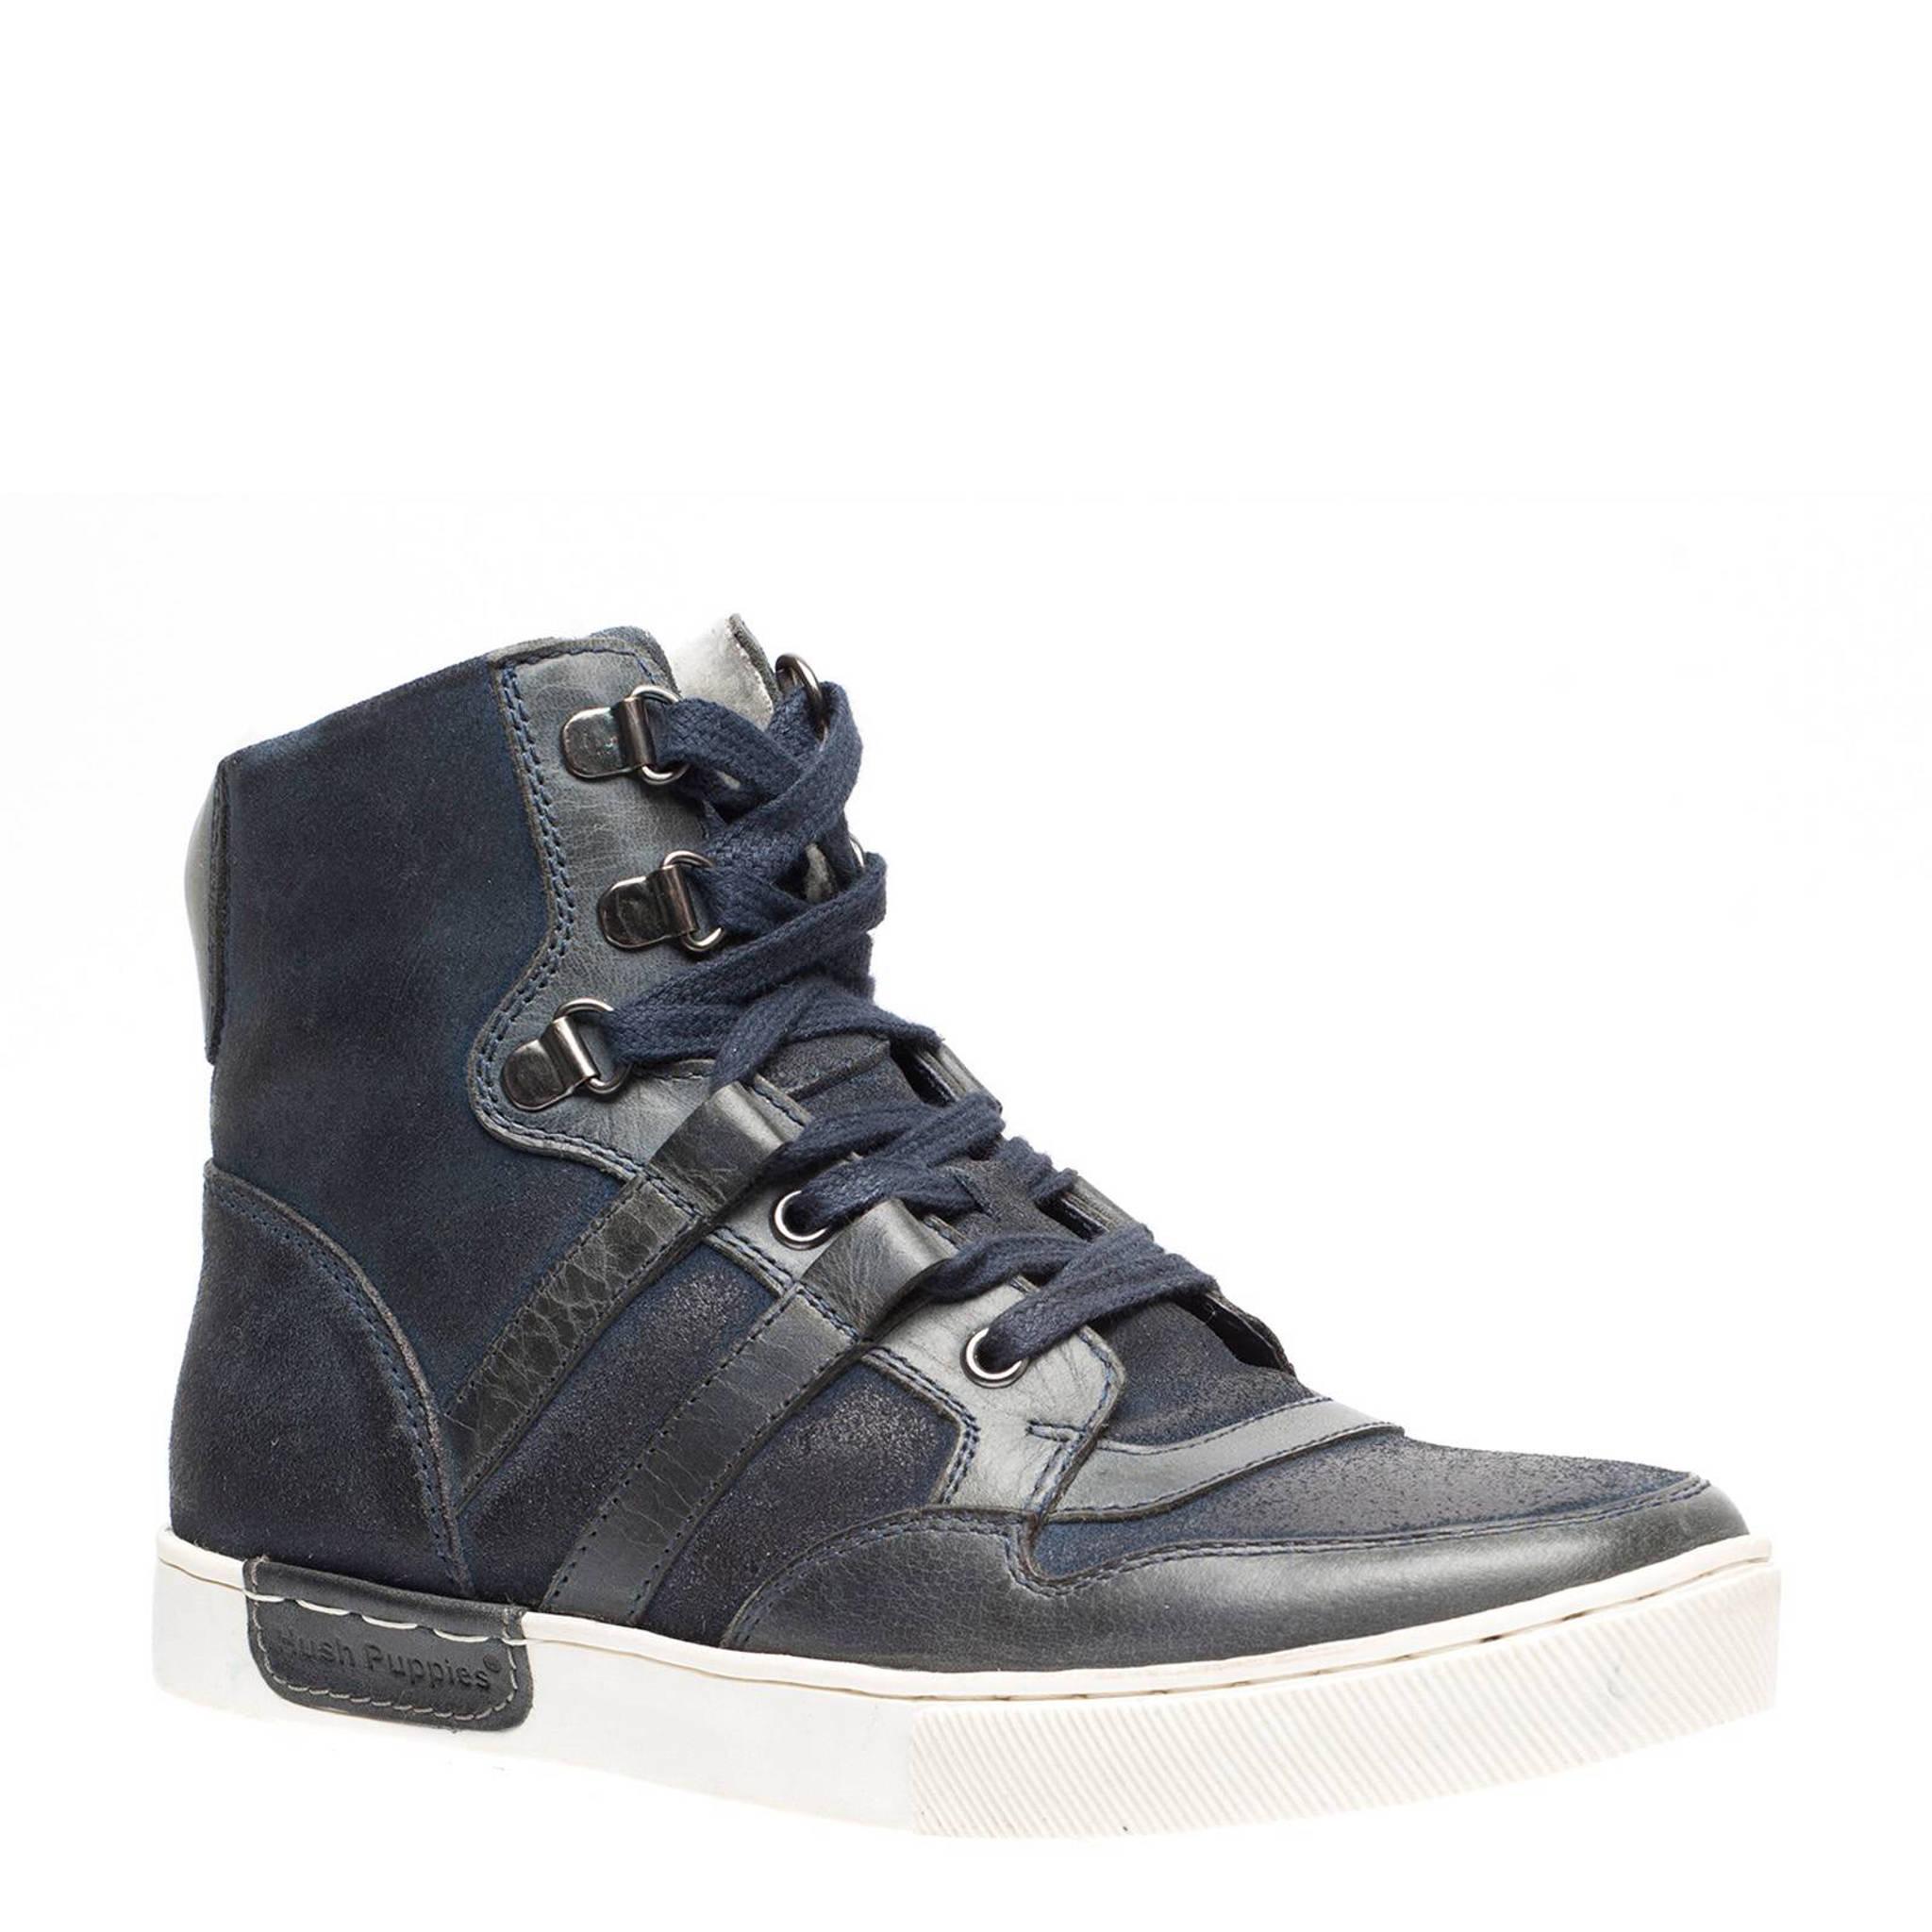 7f1164e69f6 Hush Puppies leren sneakers | wehkamp